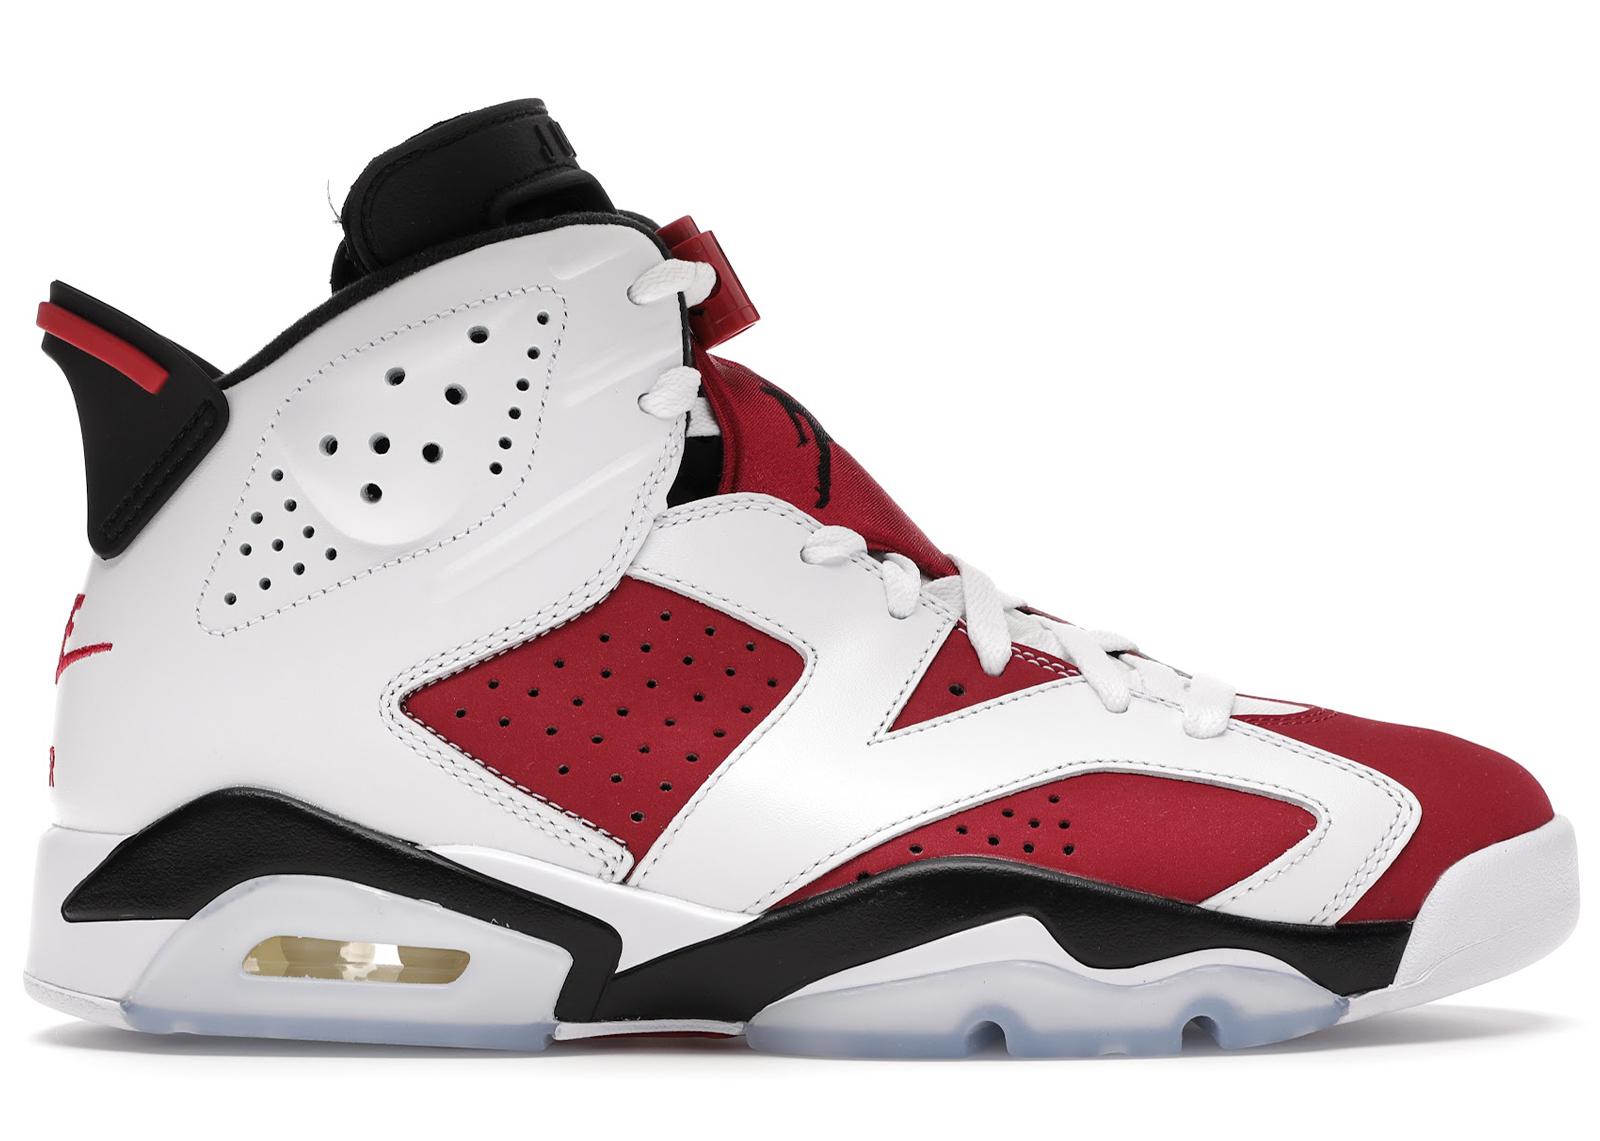 Jordan 6 - All Sizes & Colorways at StockX